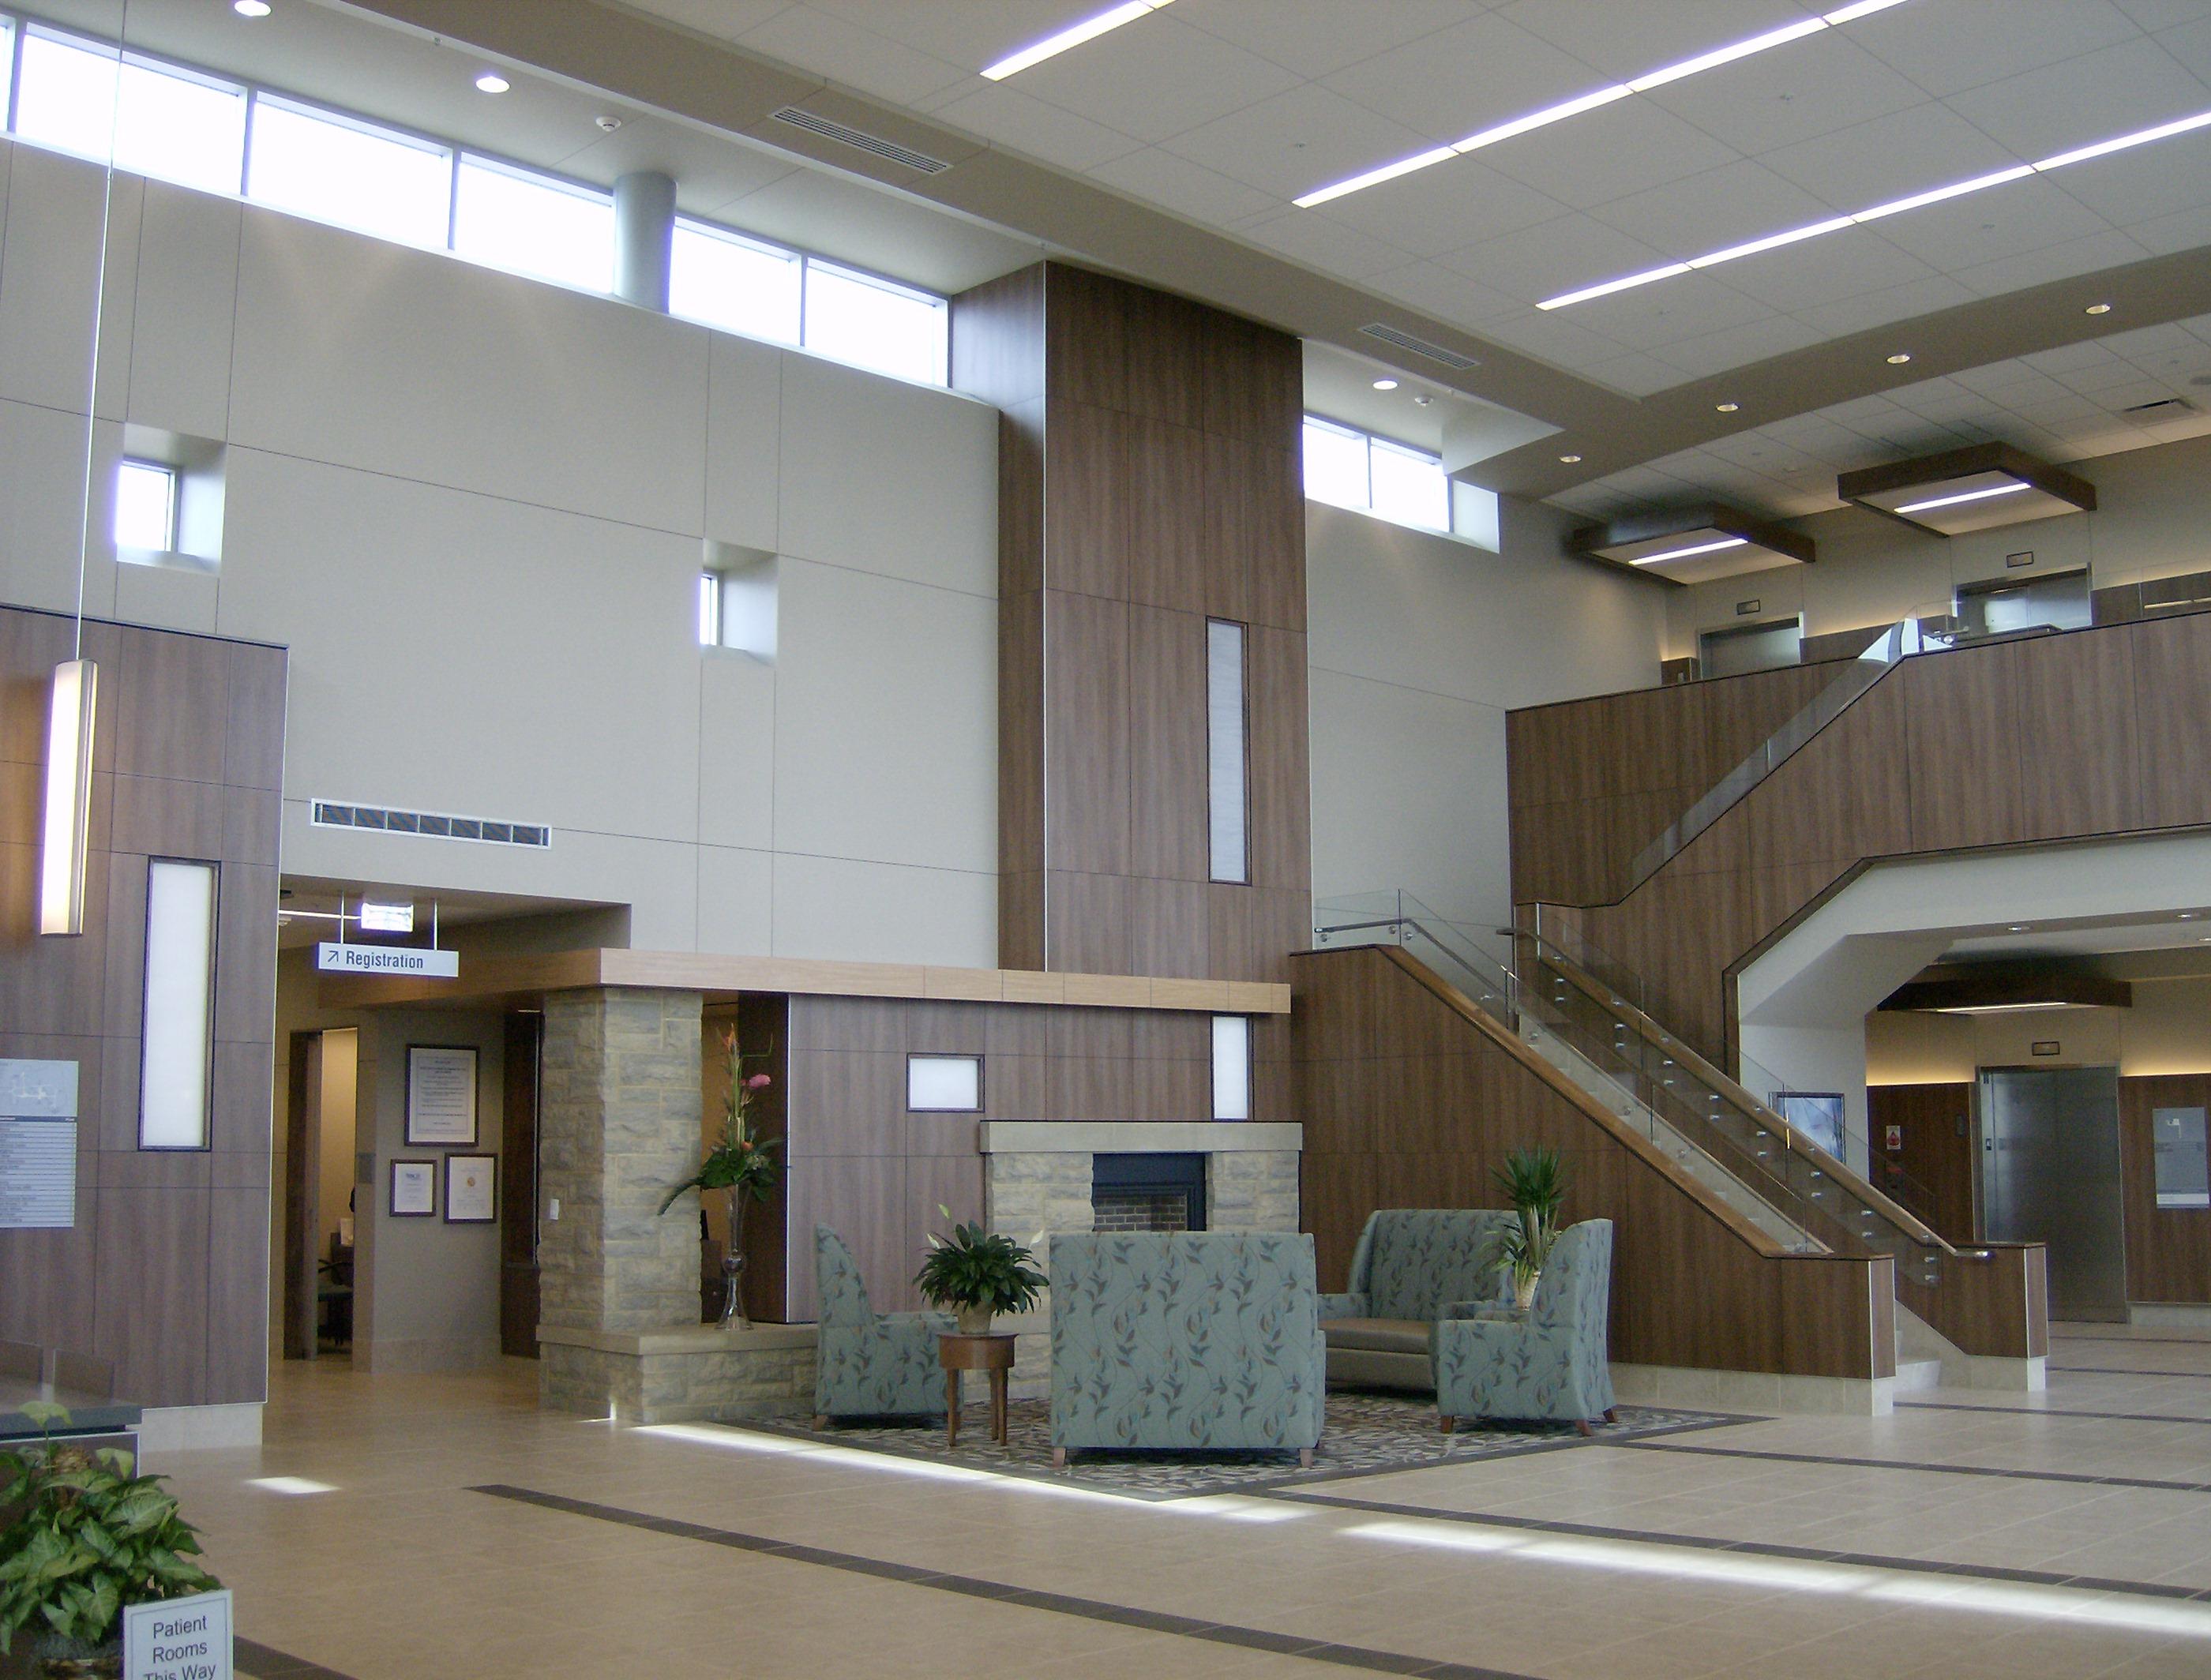 Beatrice Community Hospital